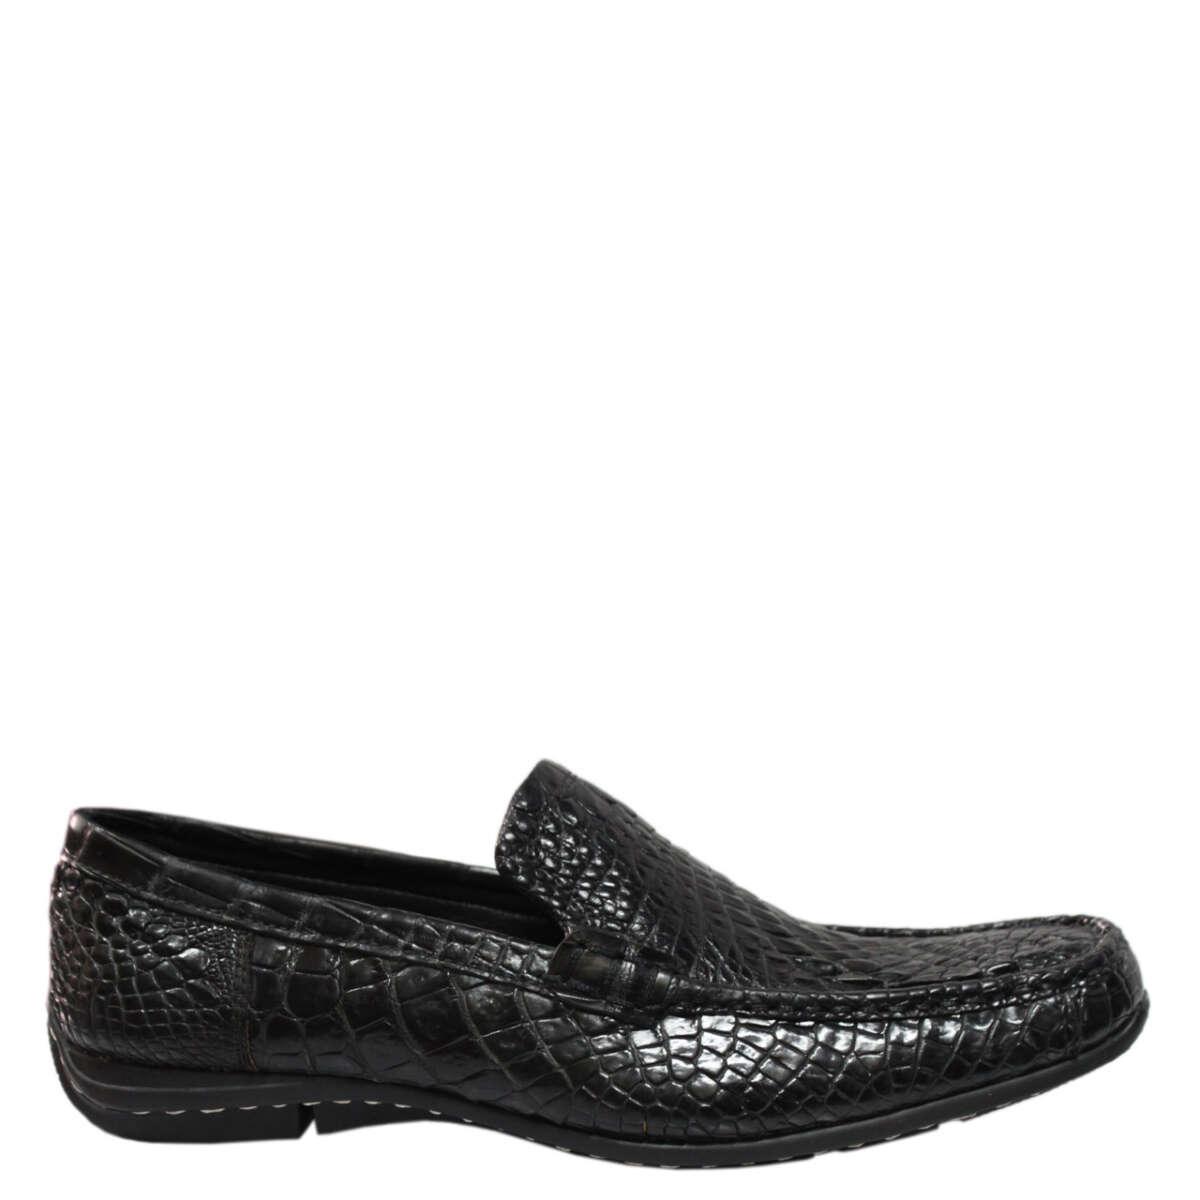 Giày lười nam da cá sấu S860a